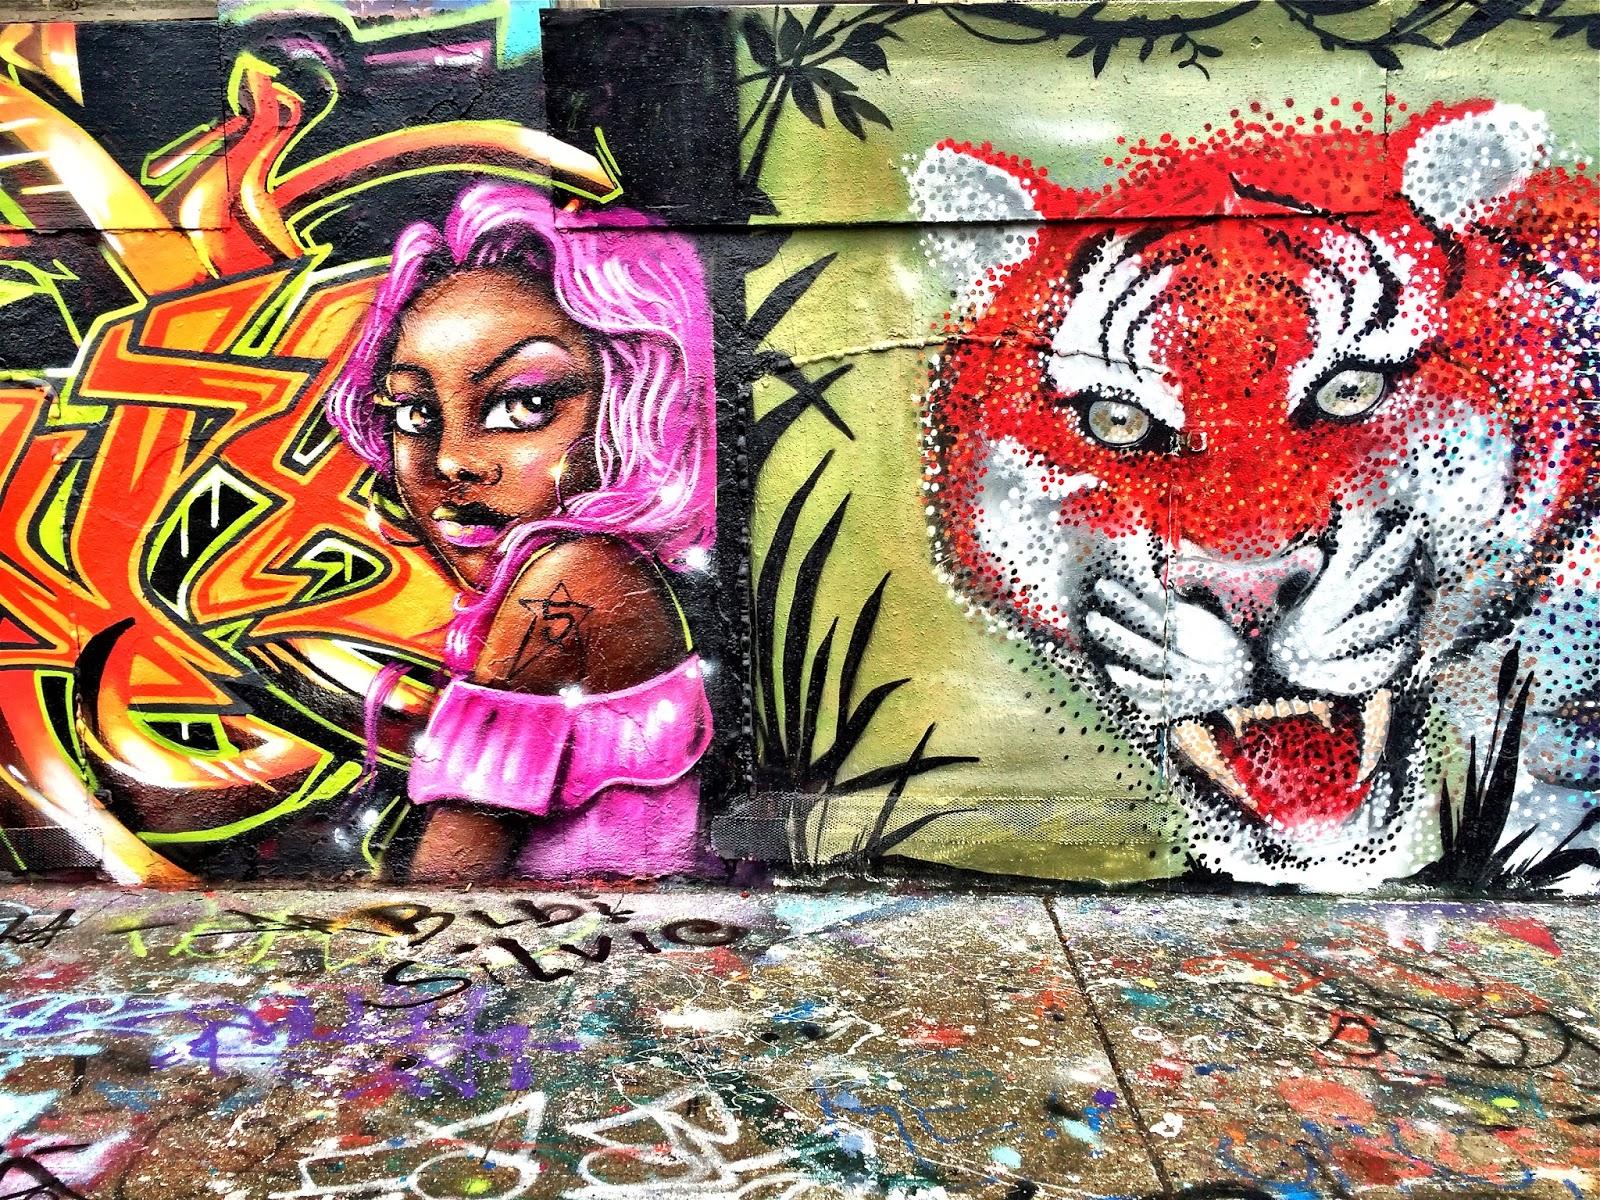 Long Island City Graffiti Mecca 5 POINTZ NYC The Day Before It Was Whitewashed